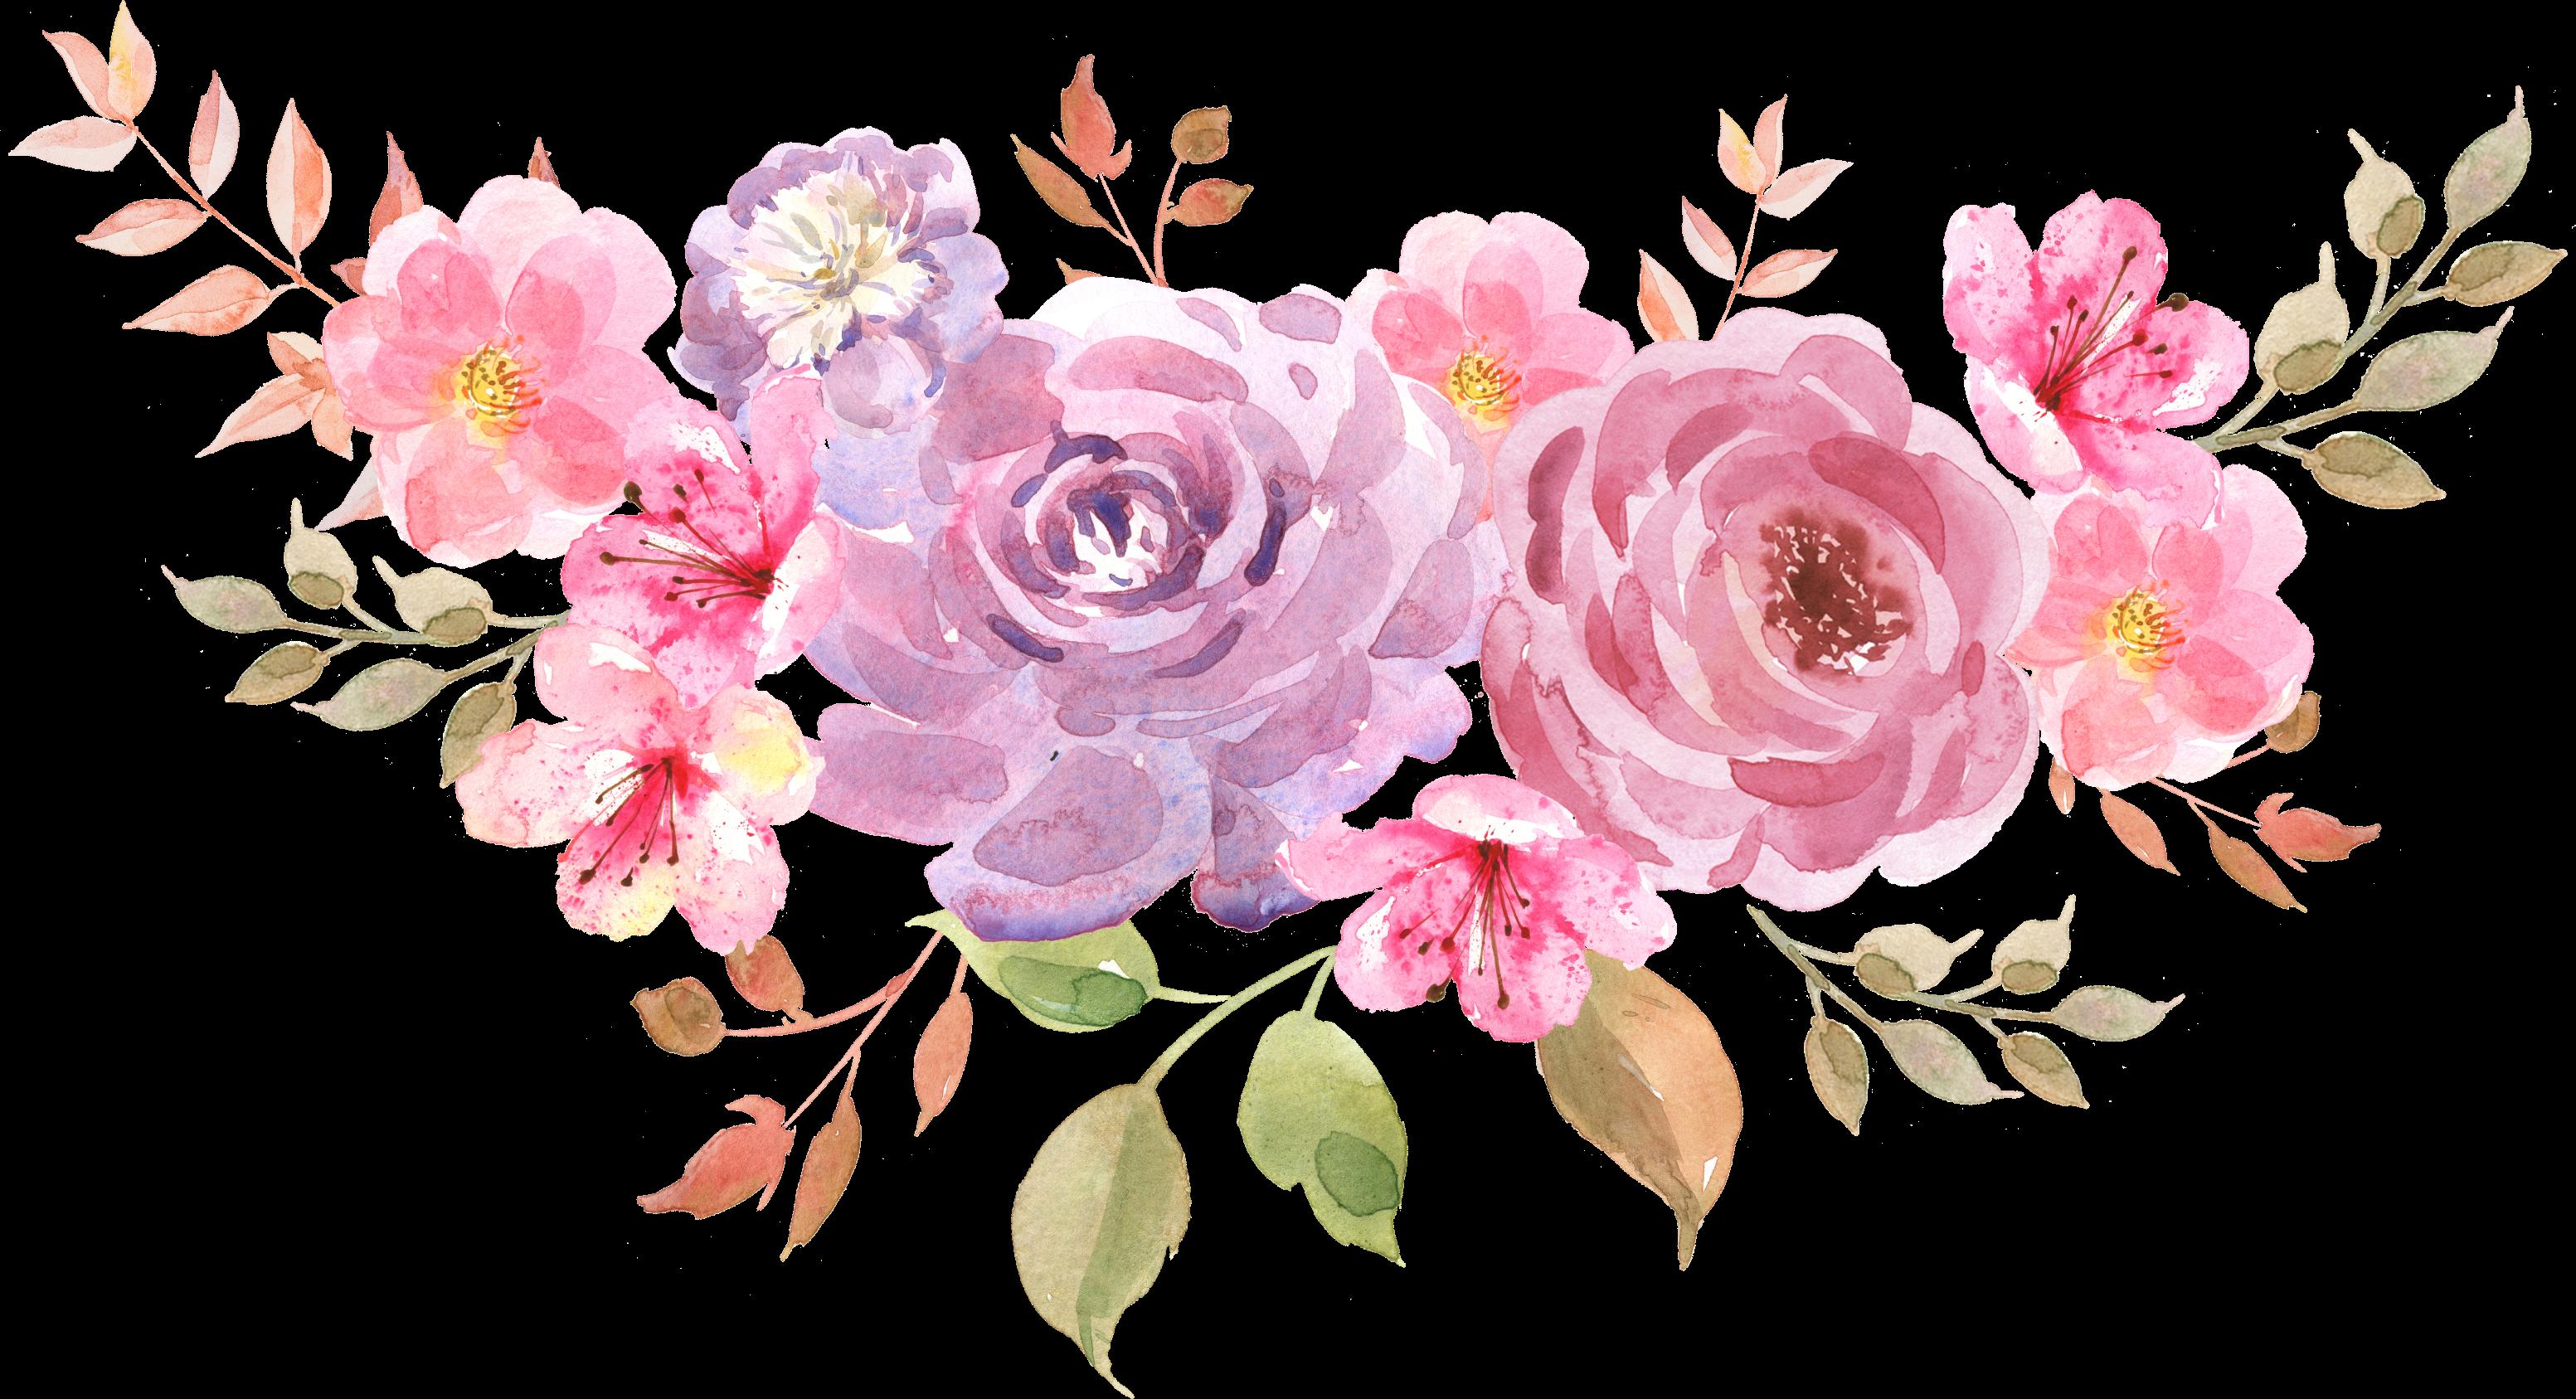 freetoedit ftestickers watercolor paint flowers cluster...